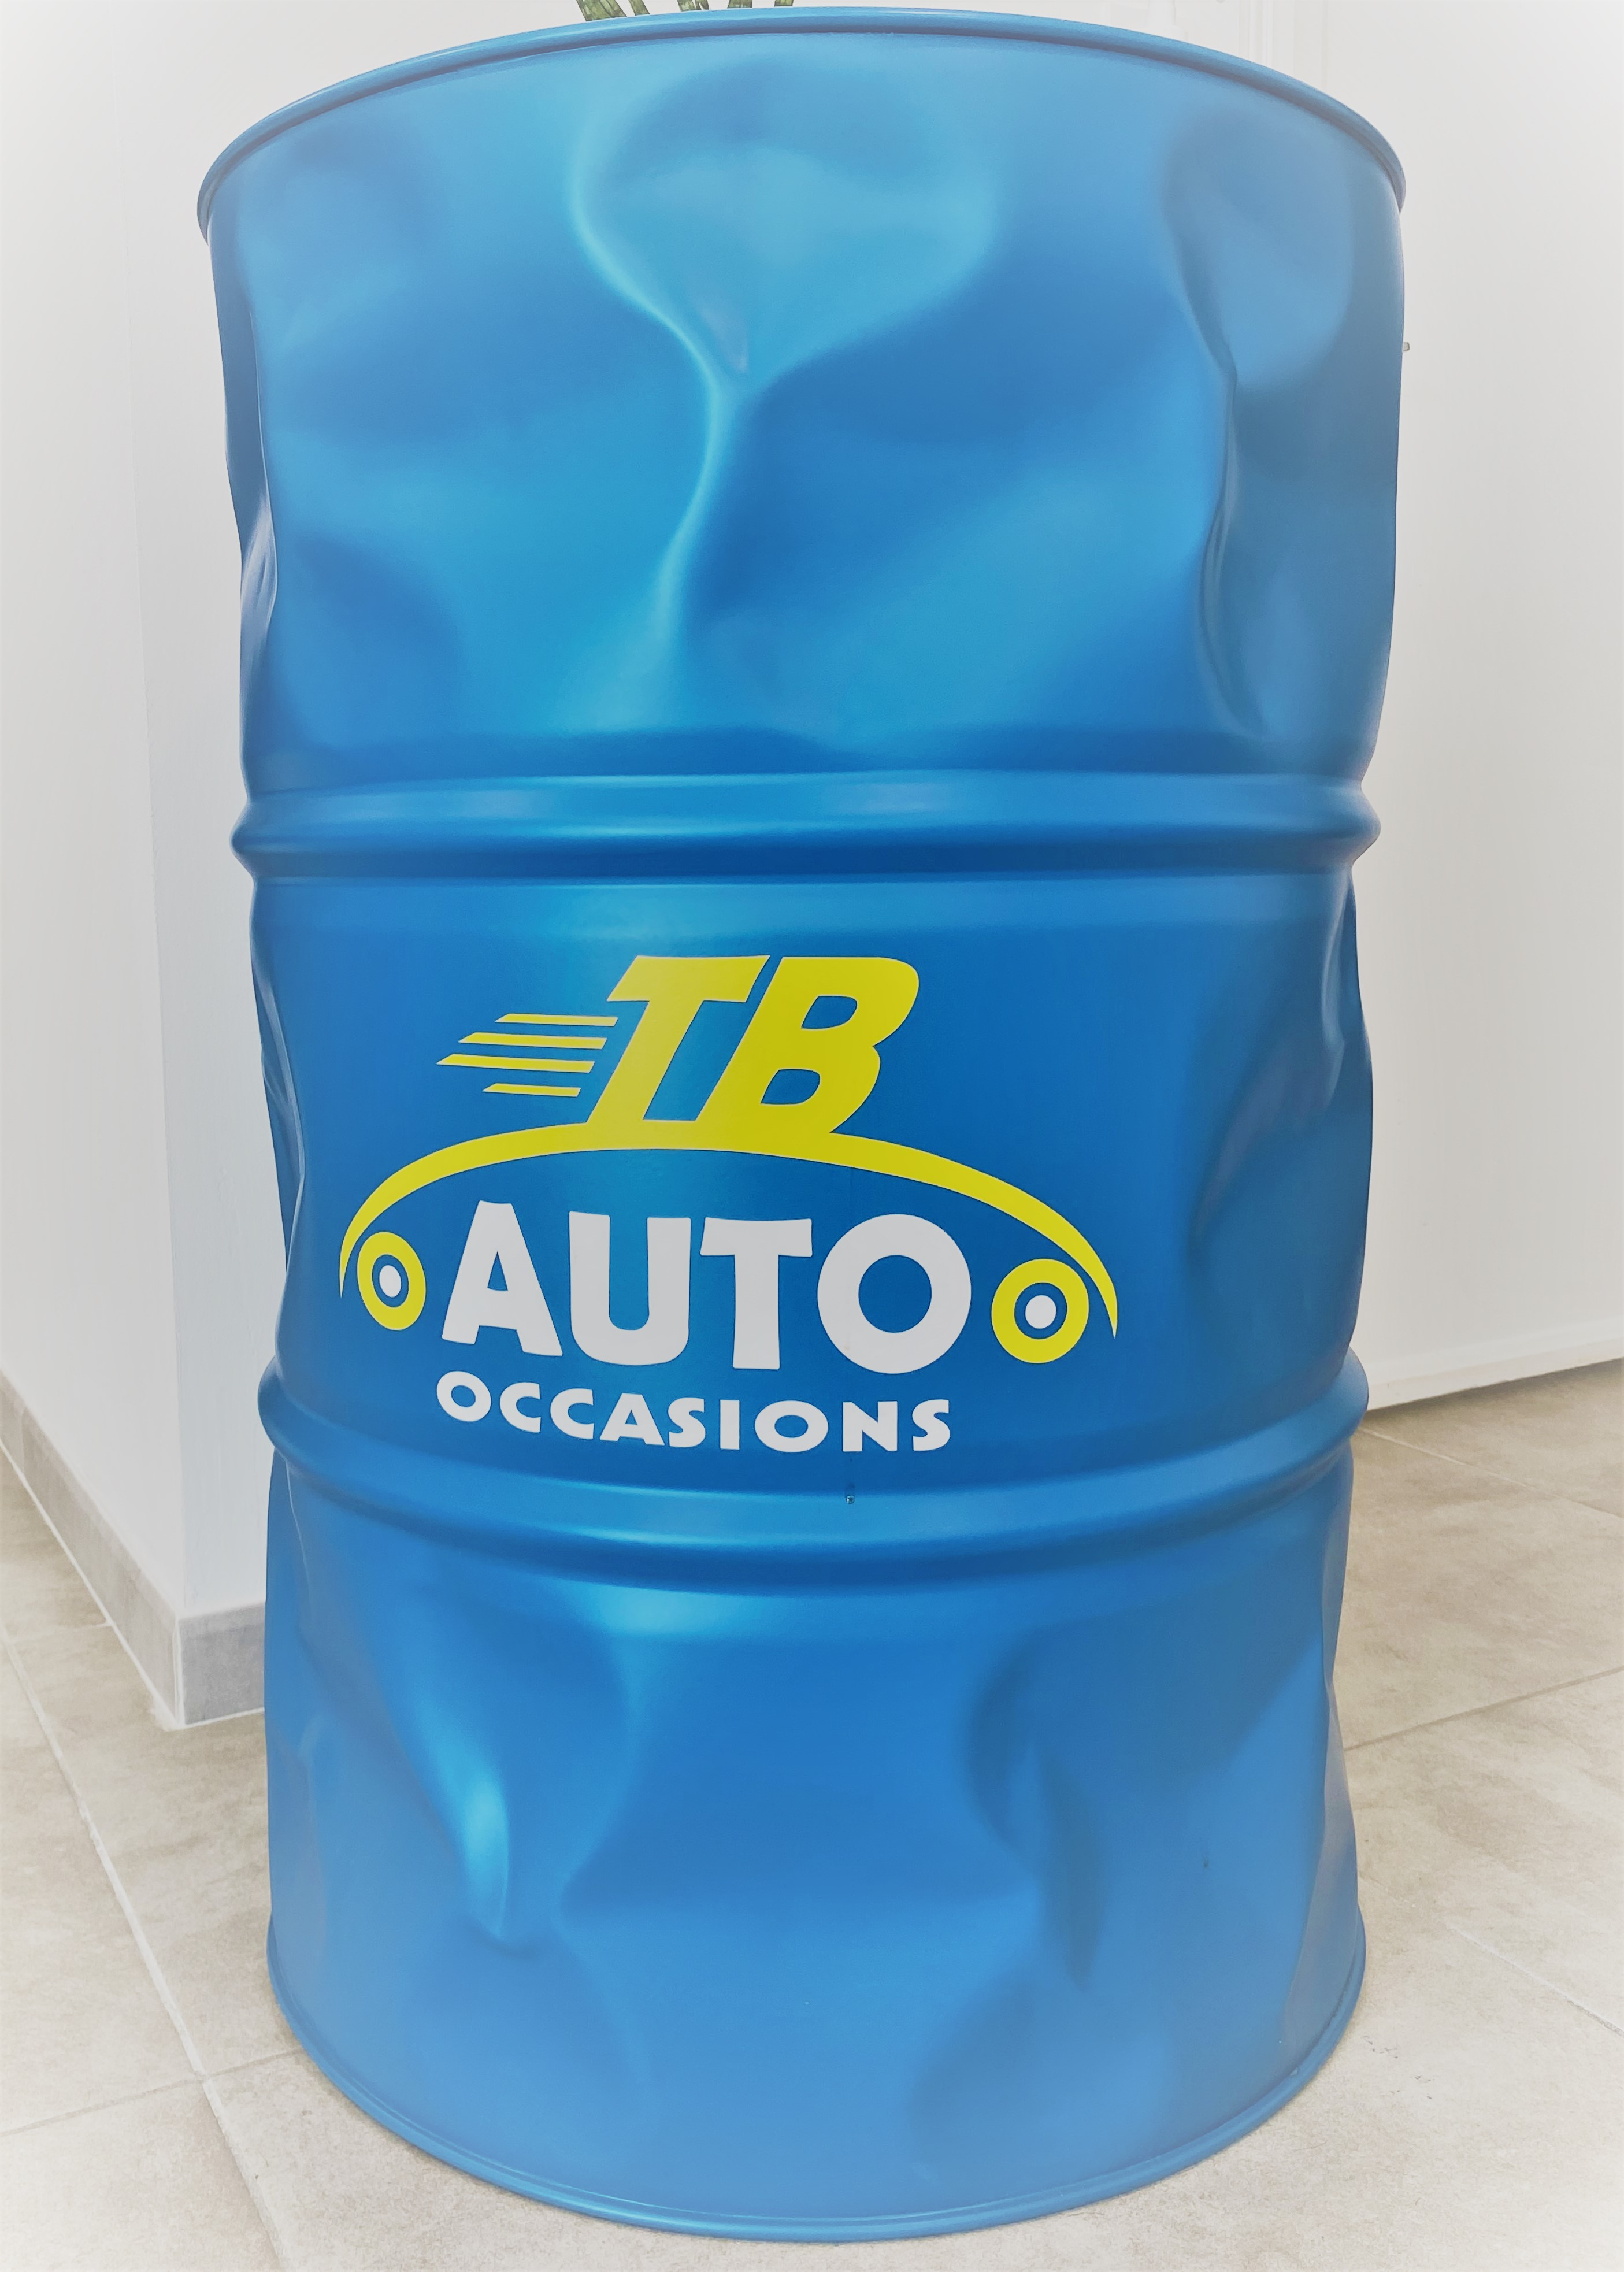 TB AUTOMOBILE